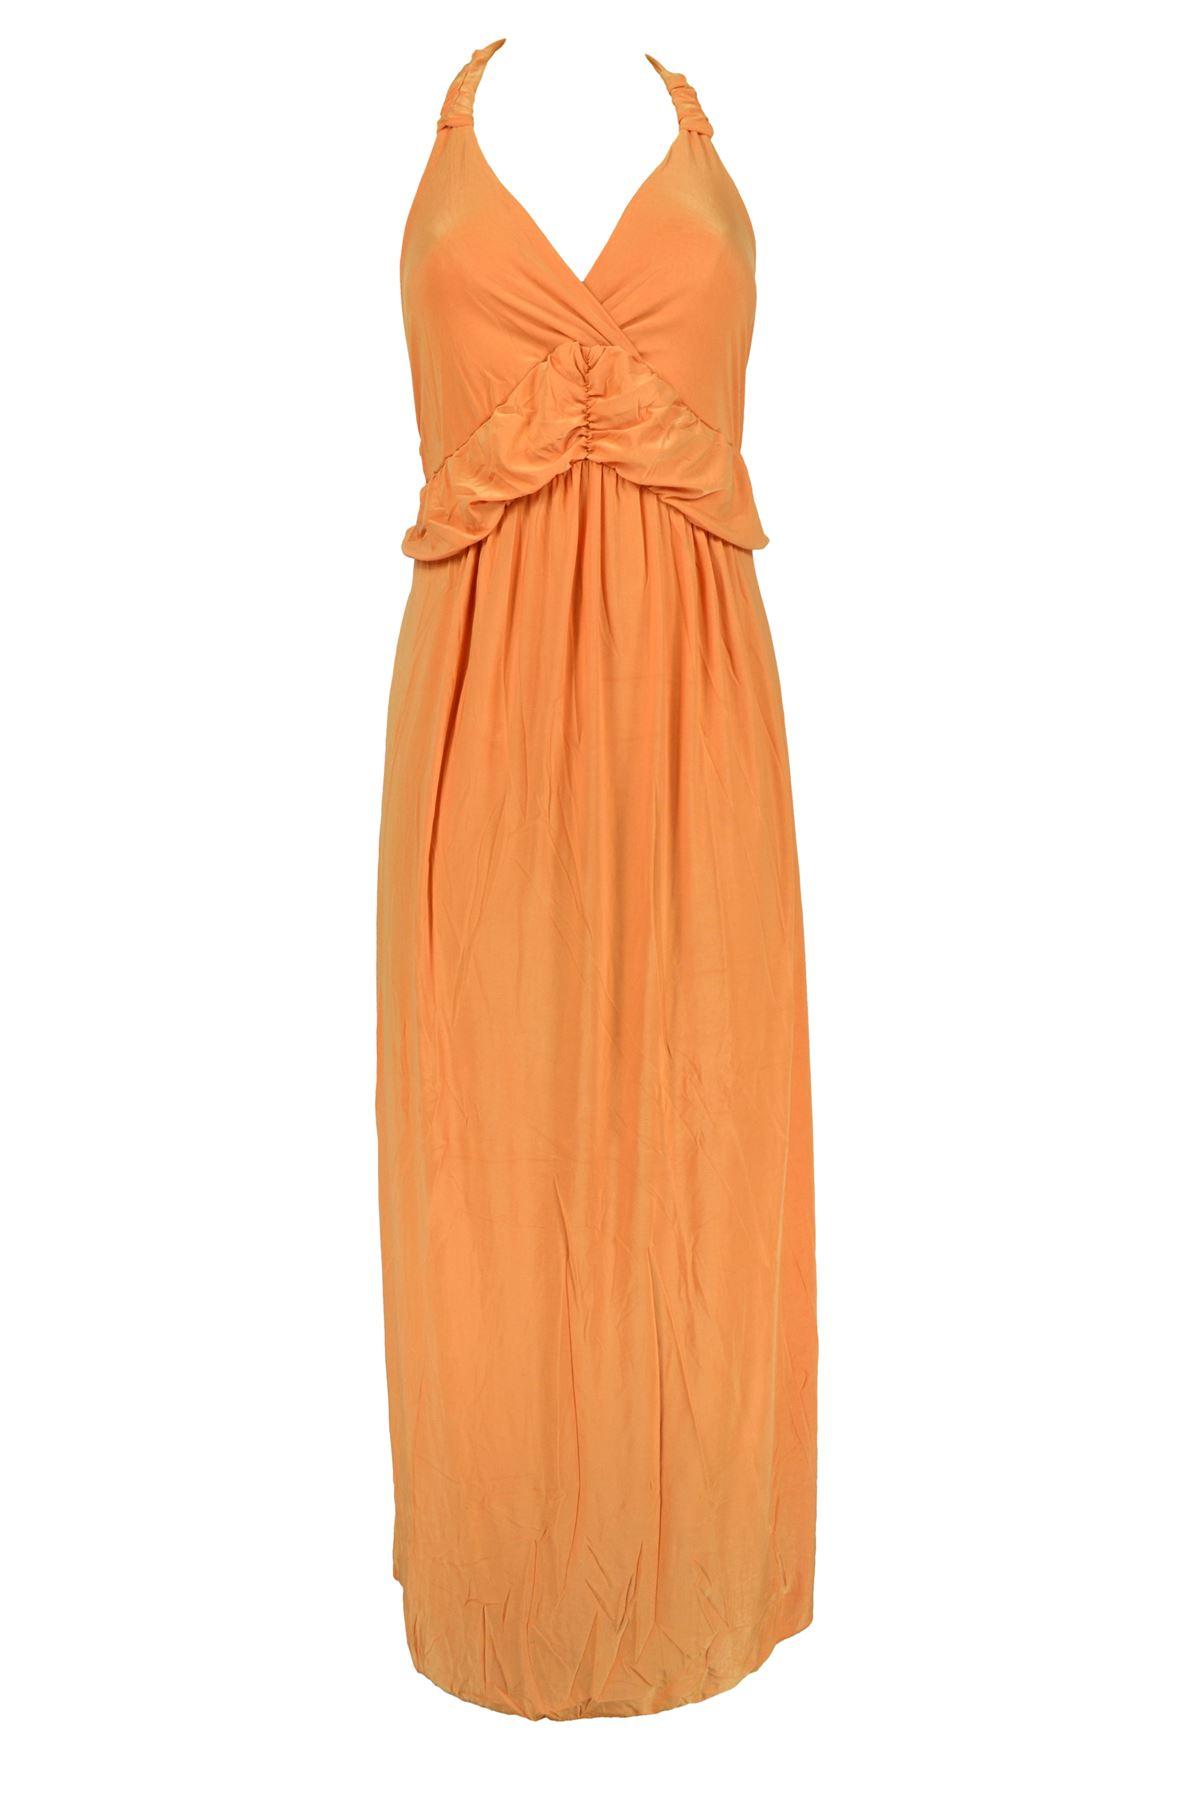 Belle Donne -Women Maxi Dress Summer Dress Top Halterneck Fashion Long Dress - Orange